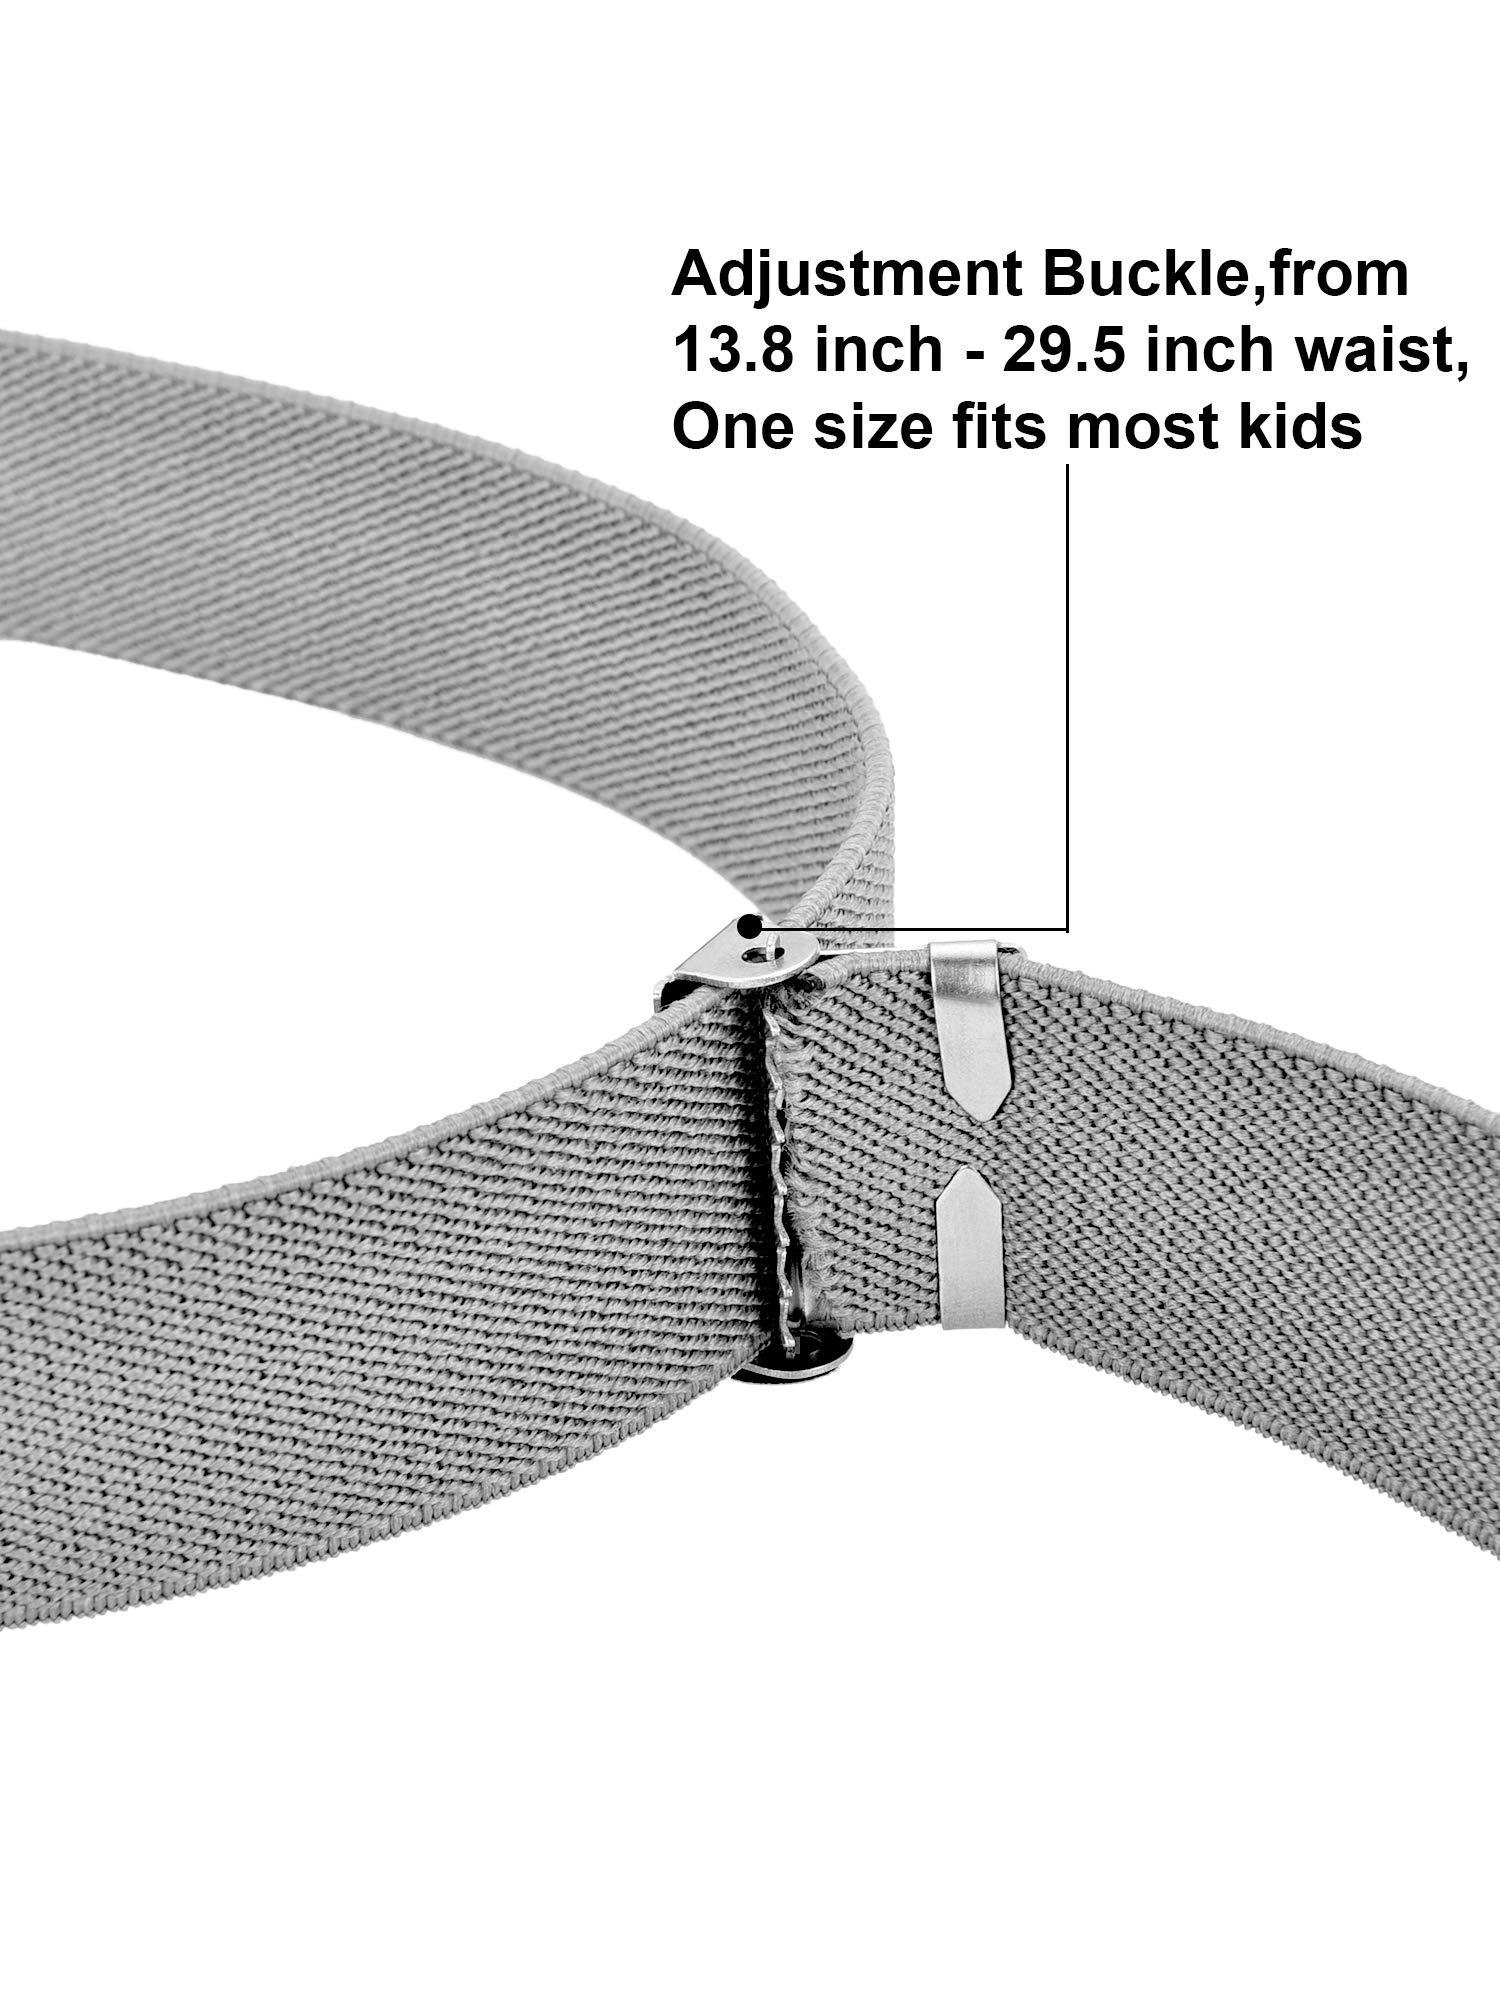 Tatuo 4 Pieces Kids Buckle Belt Kid Adjustable Elastic Belt Boy Stretch Belt for Children Favor (black, gray, brown, navy blue) by Tatuo (Image #3)